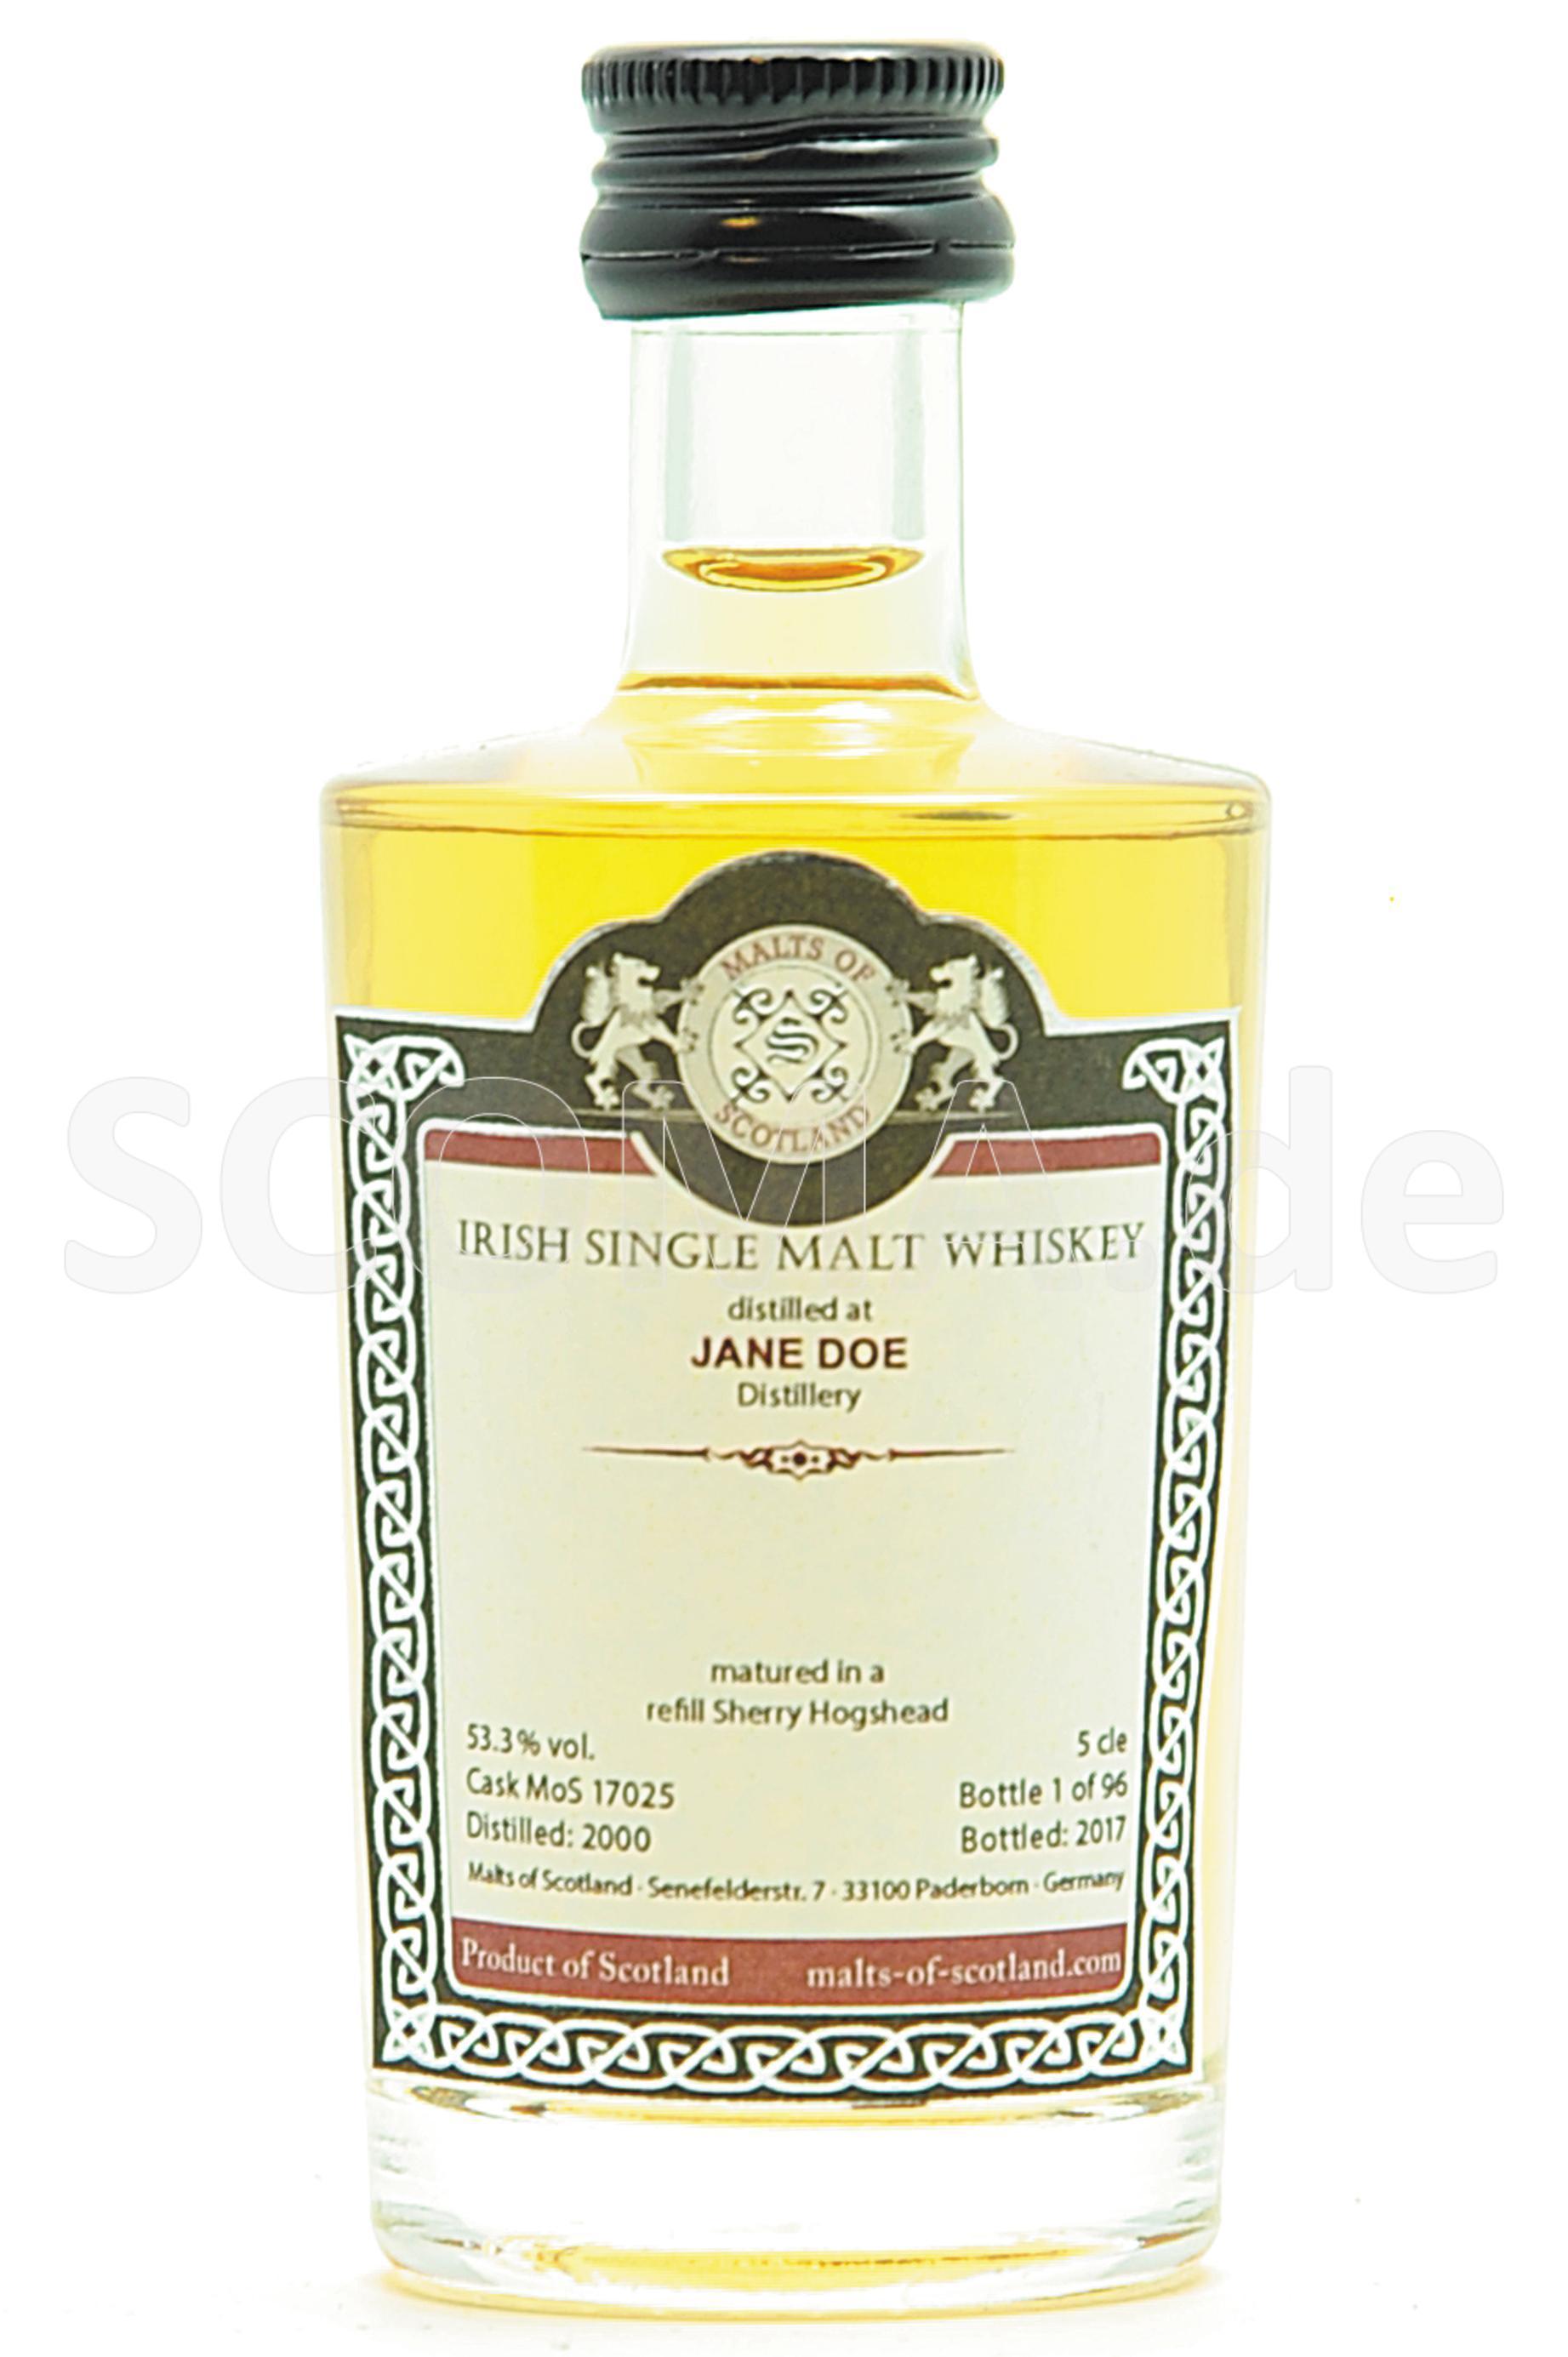 Jane Doe 2000/2017 Refill Sher...